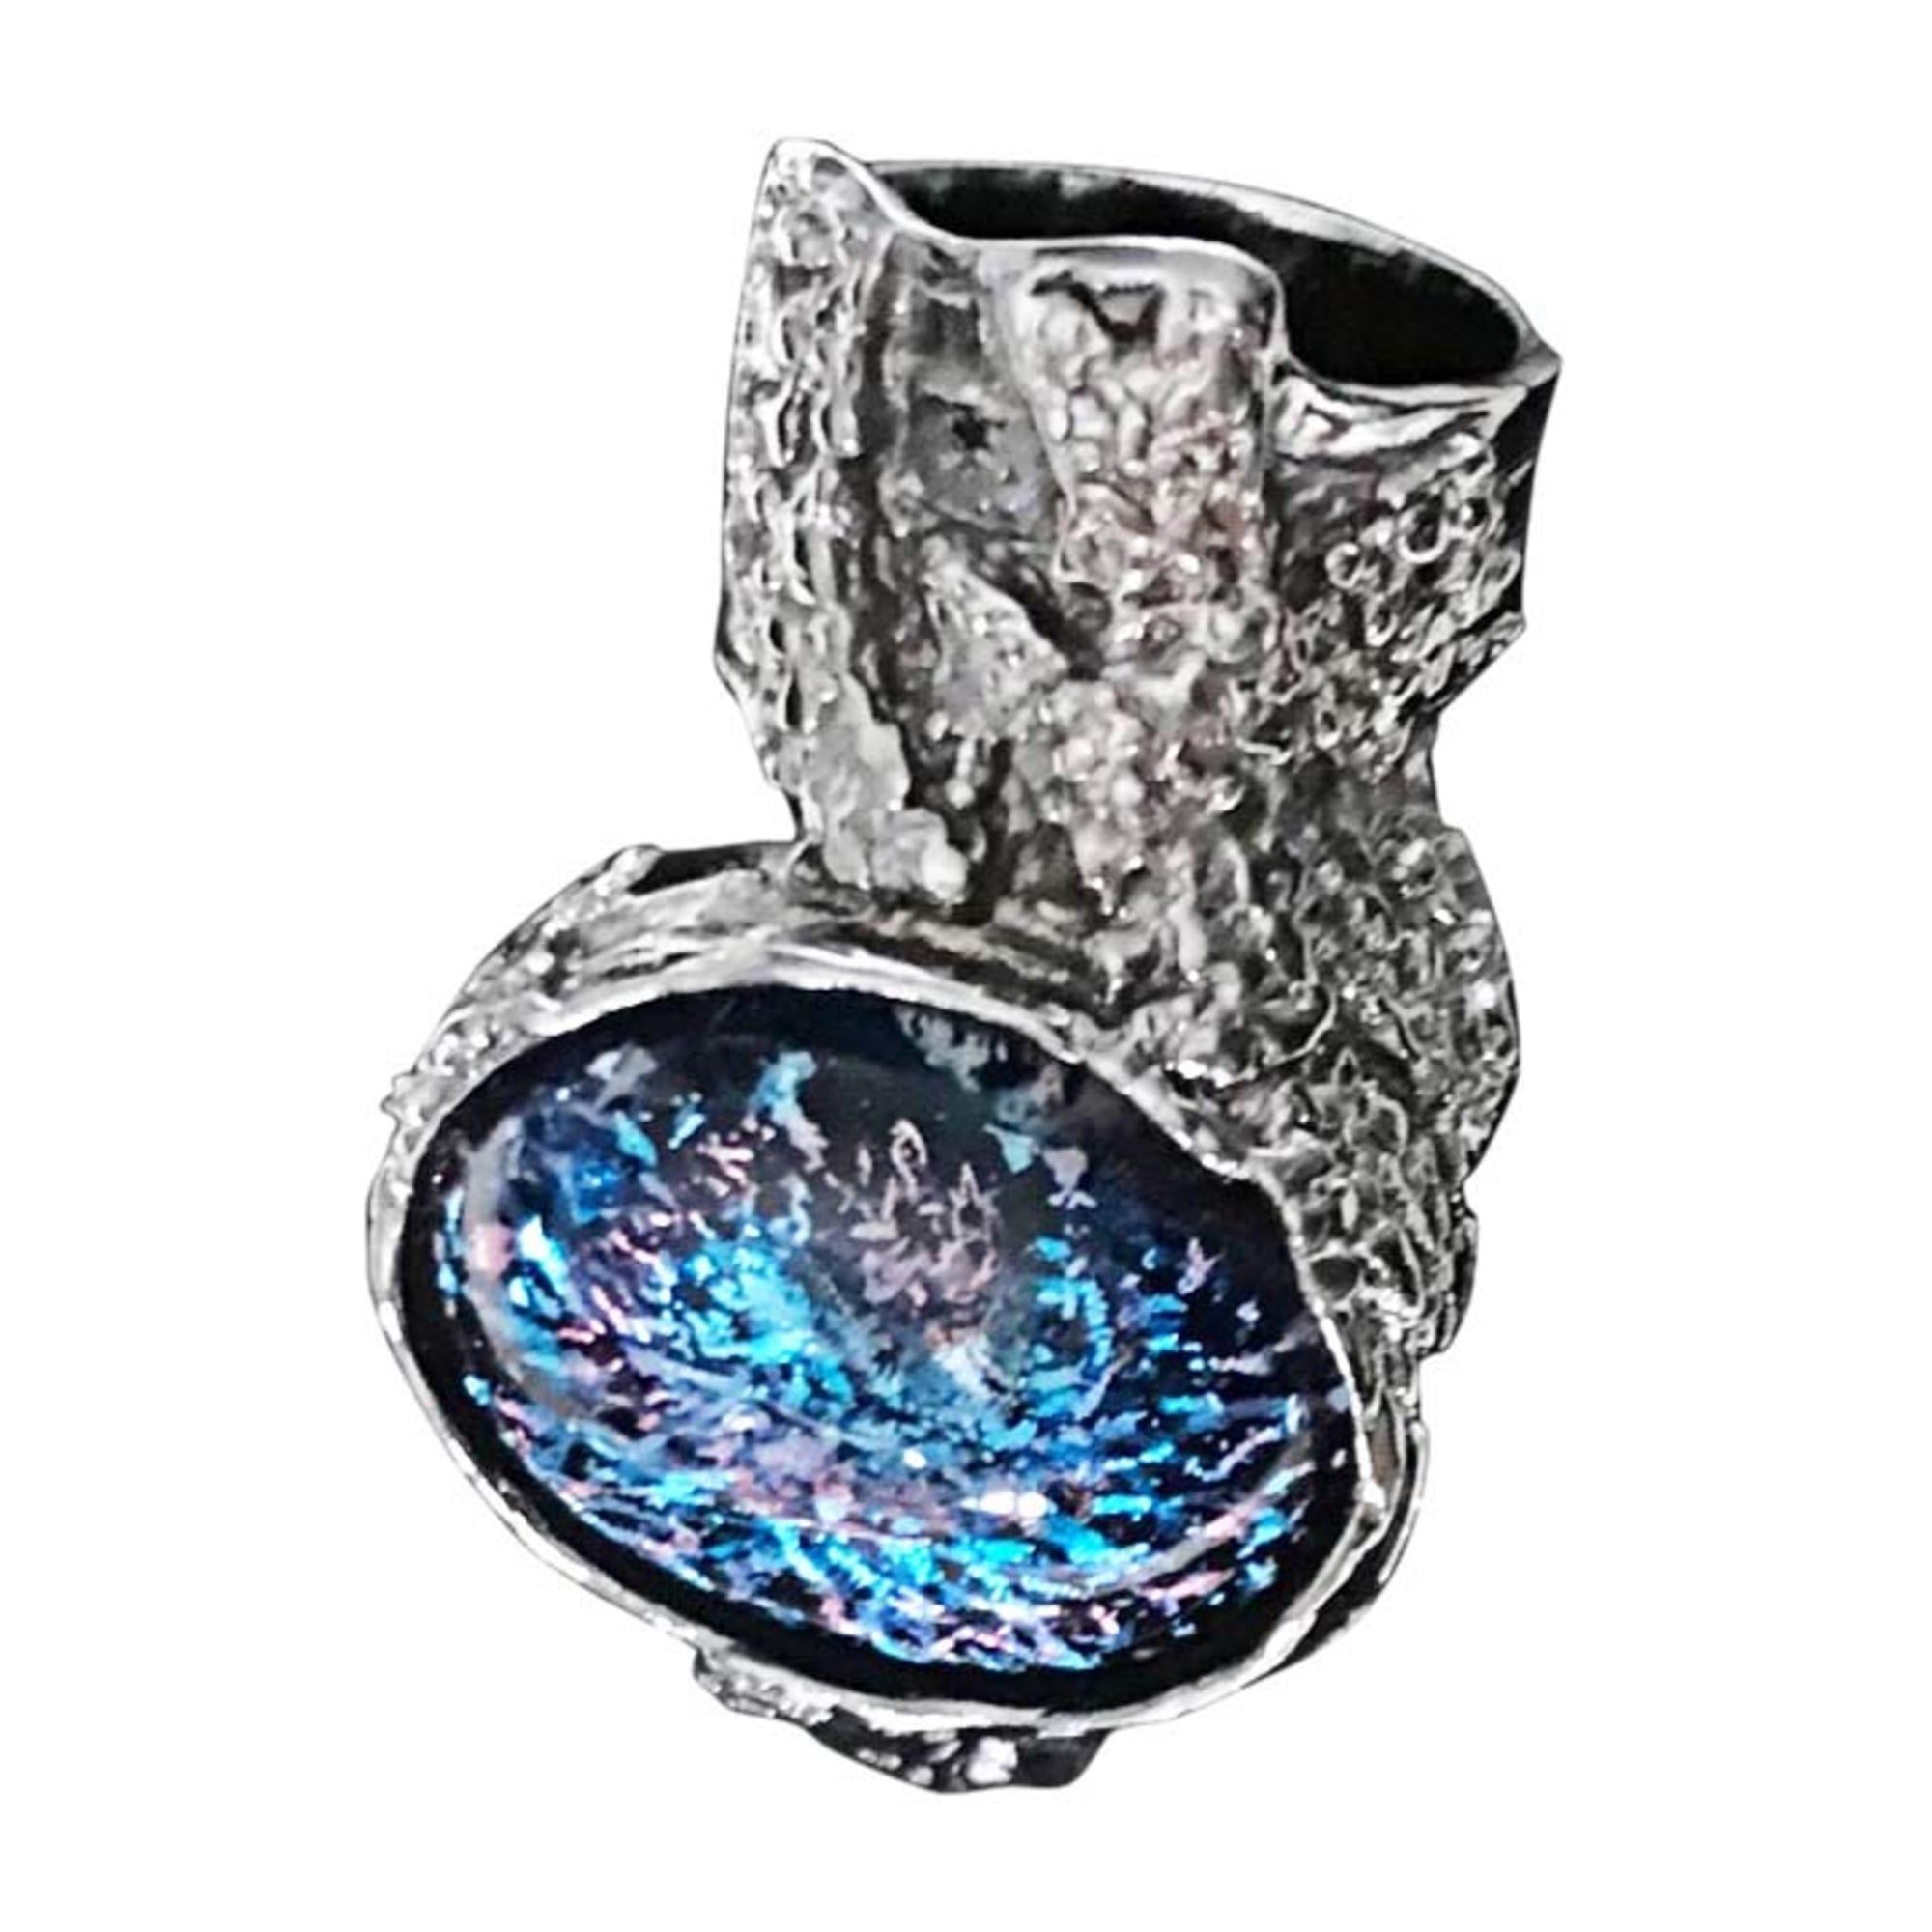 Ring YVES SAINT LAURENT Silver